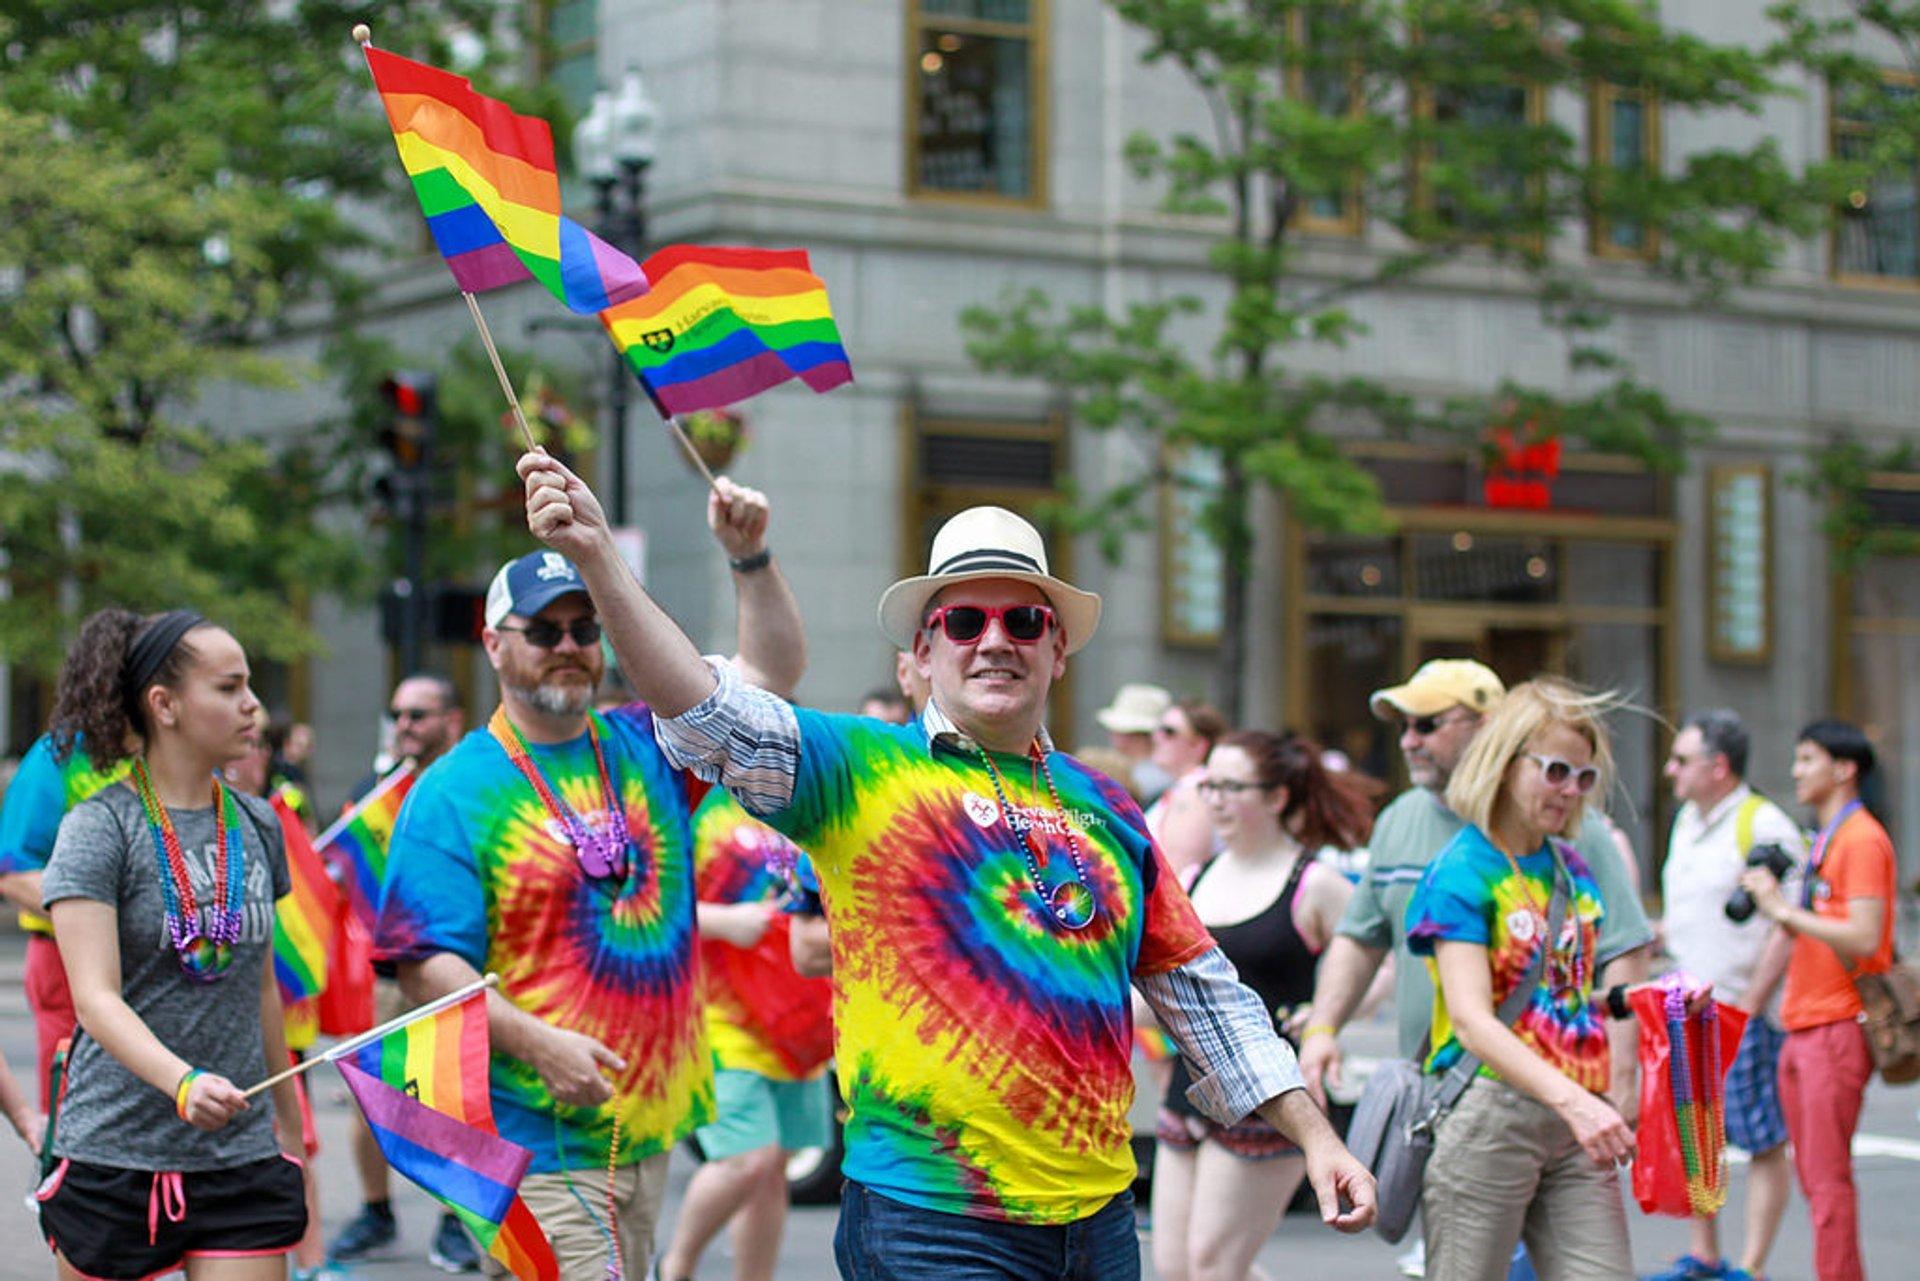 Boston Pride Parade in Boston - Best Season 2020